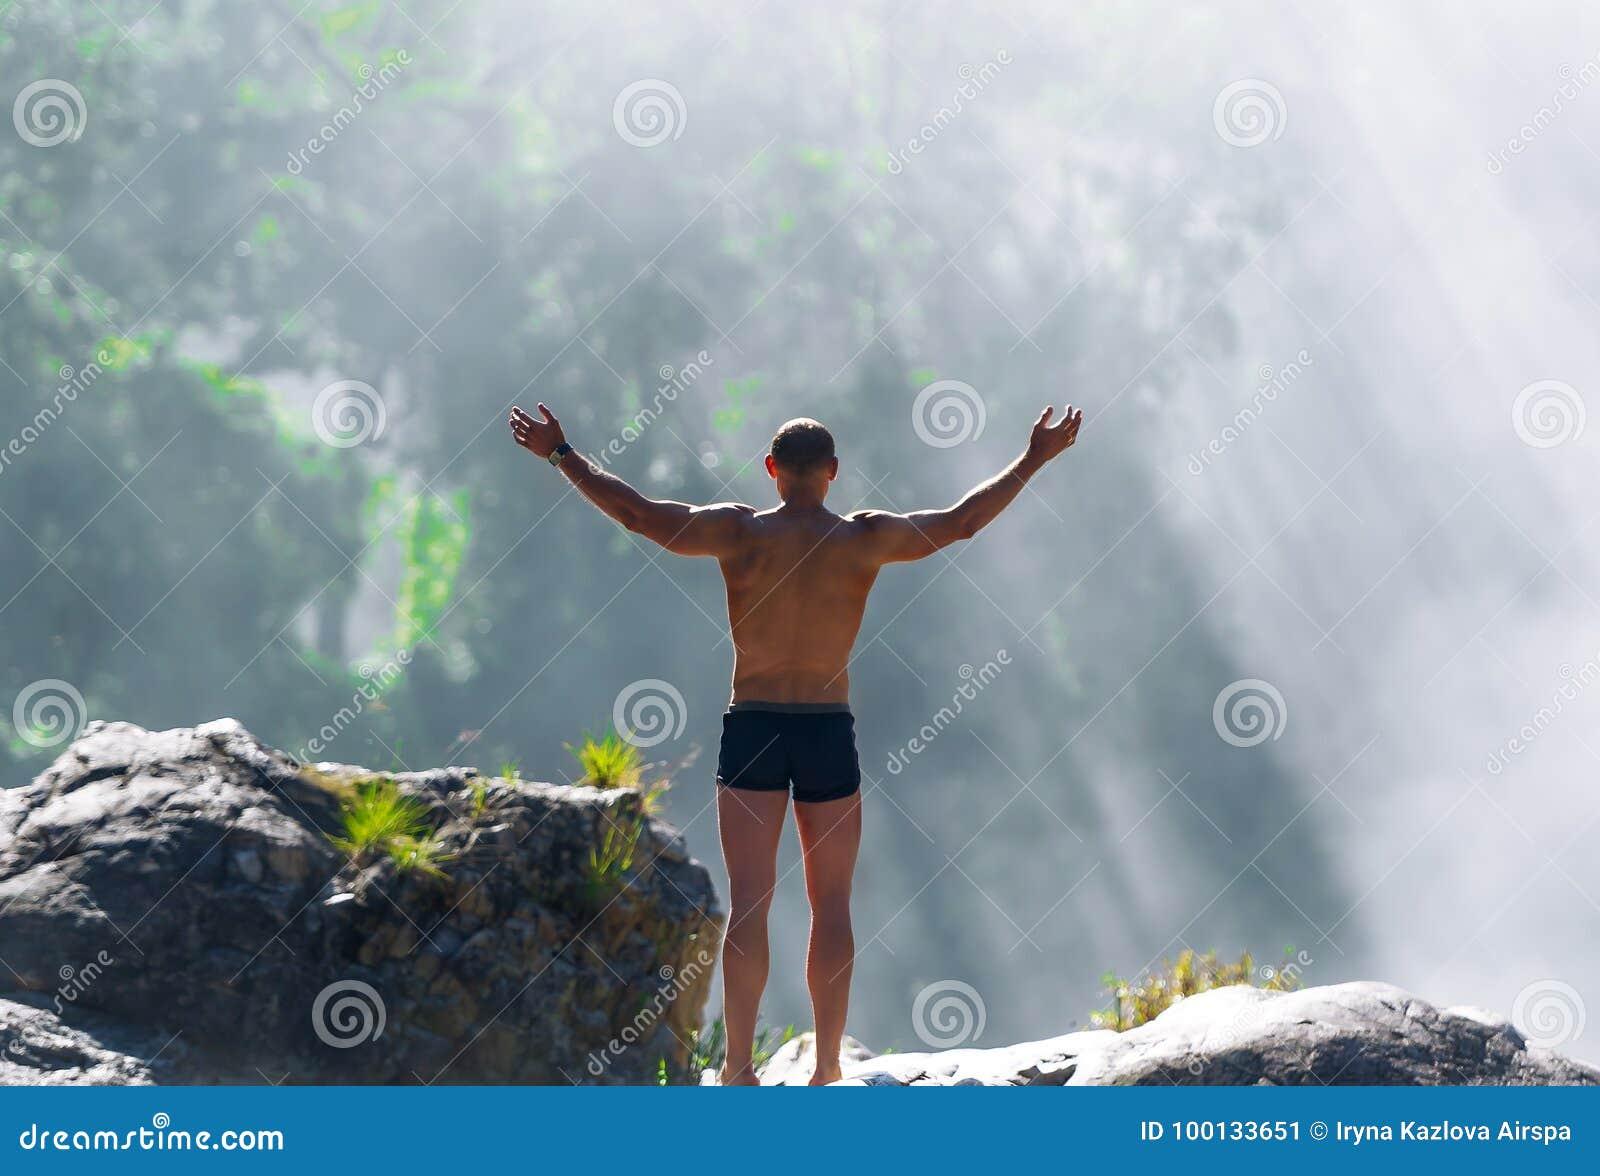 Man on mountain in Vietnam. Sunrise. Emotional scene.